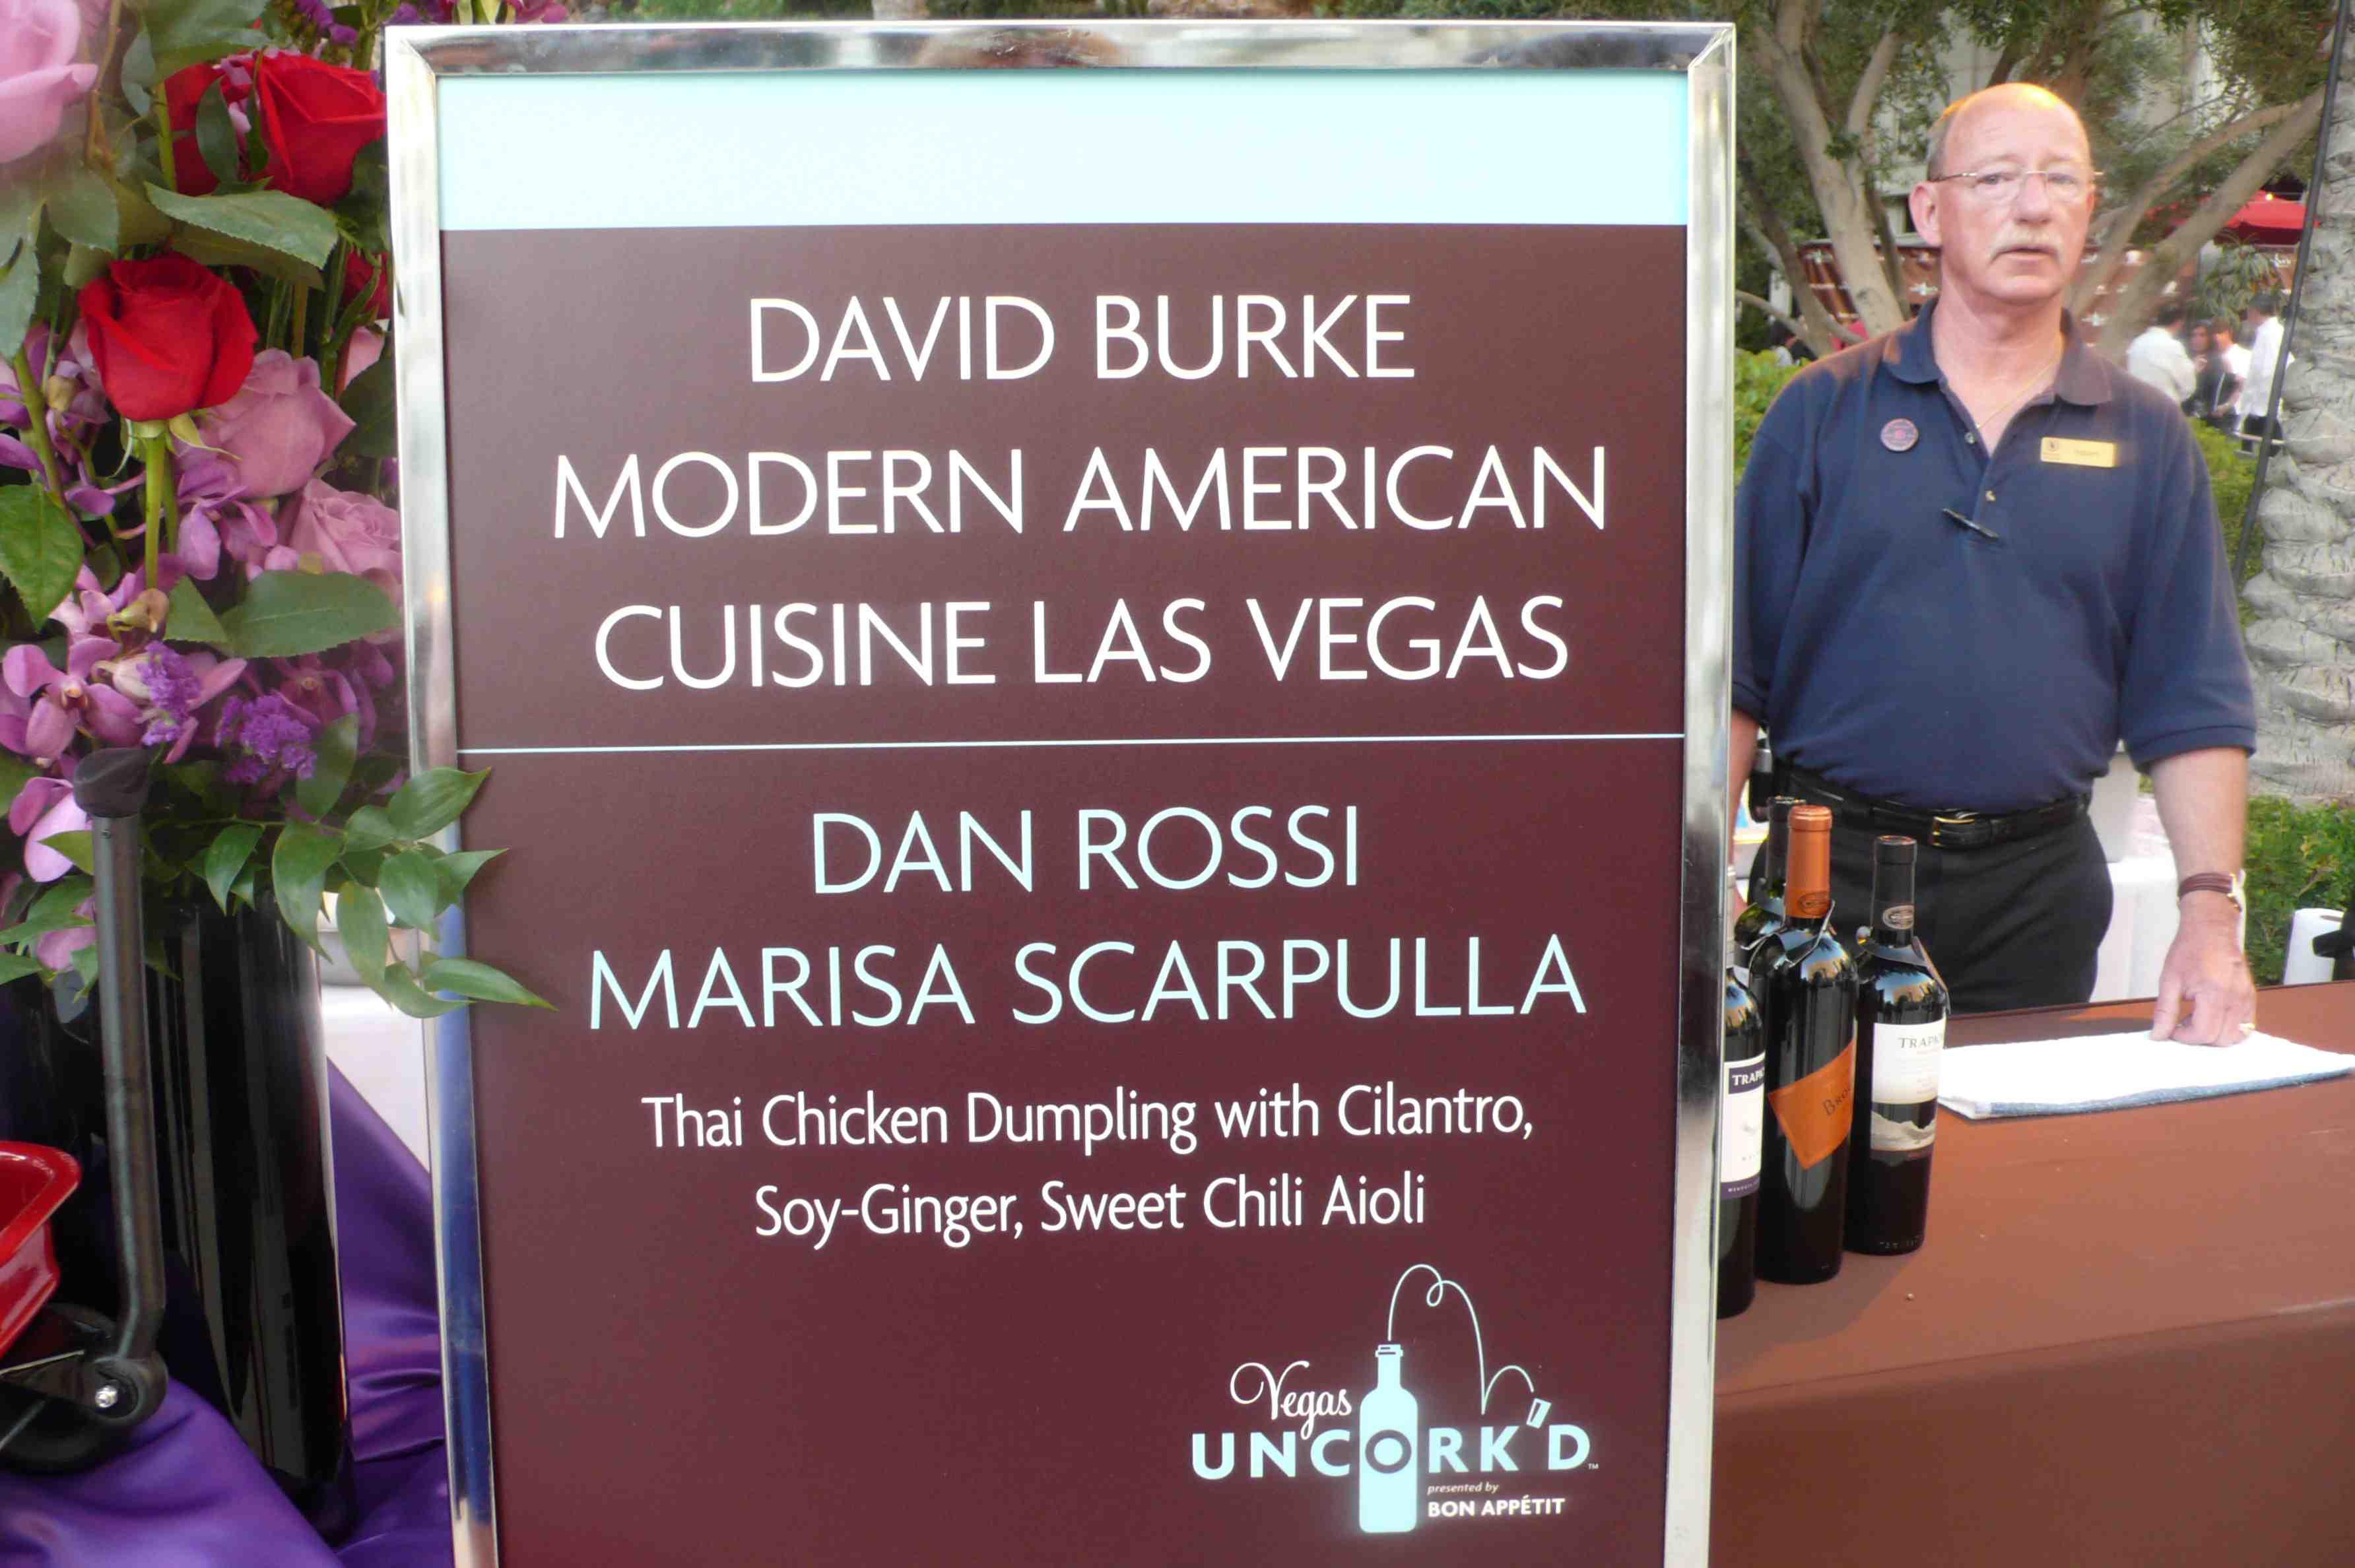 David Burke, Modern American Cuisine, Venetian